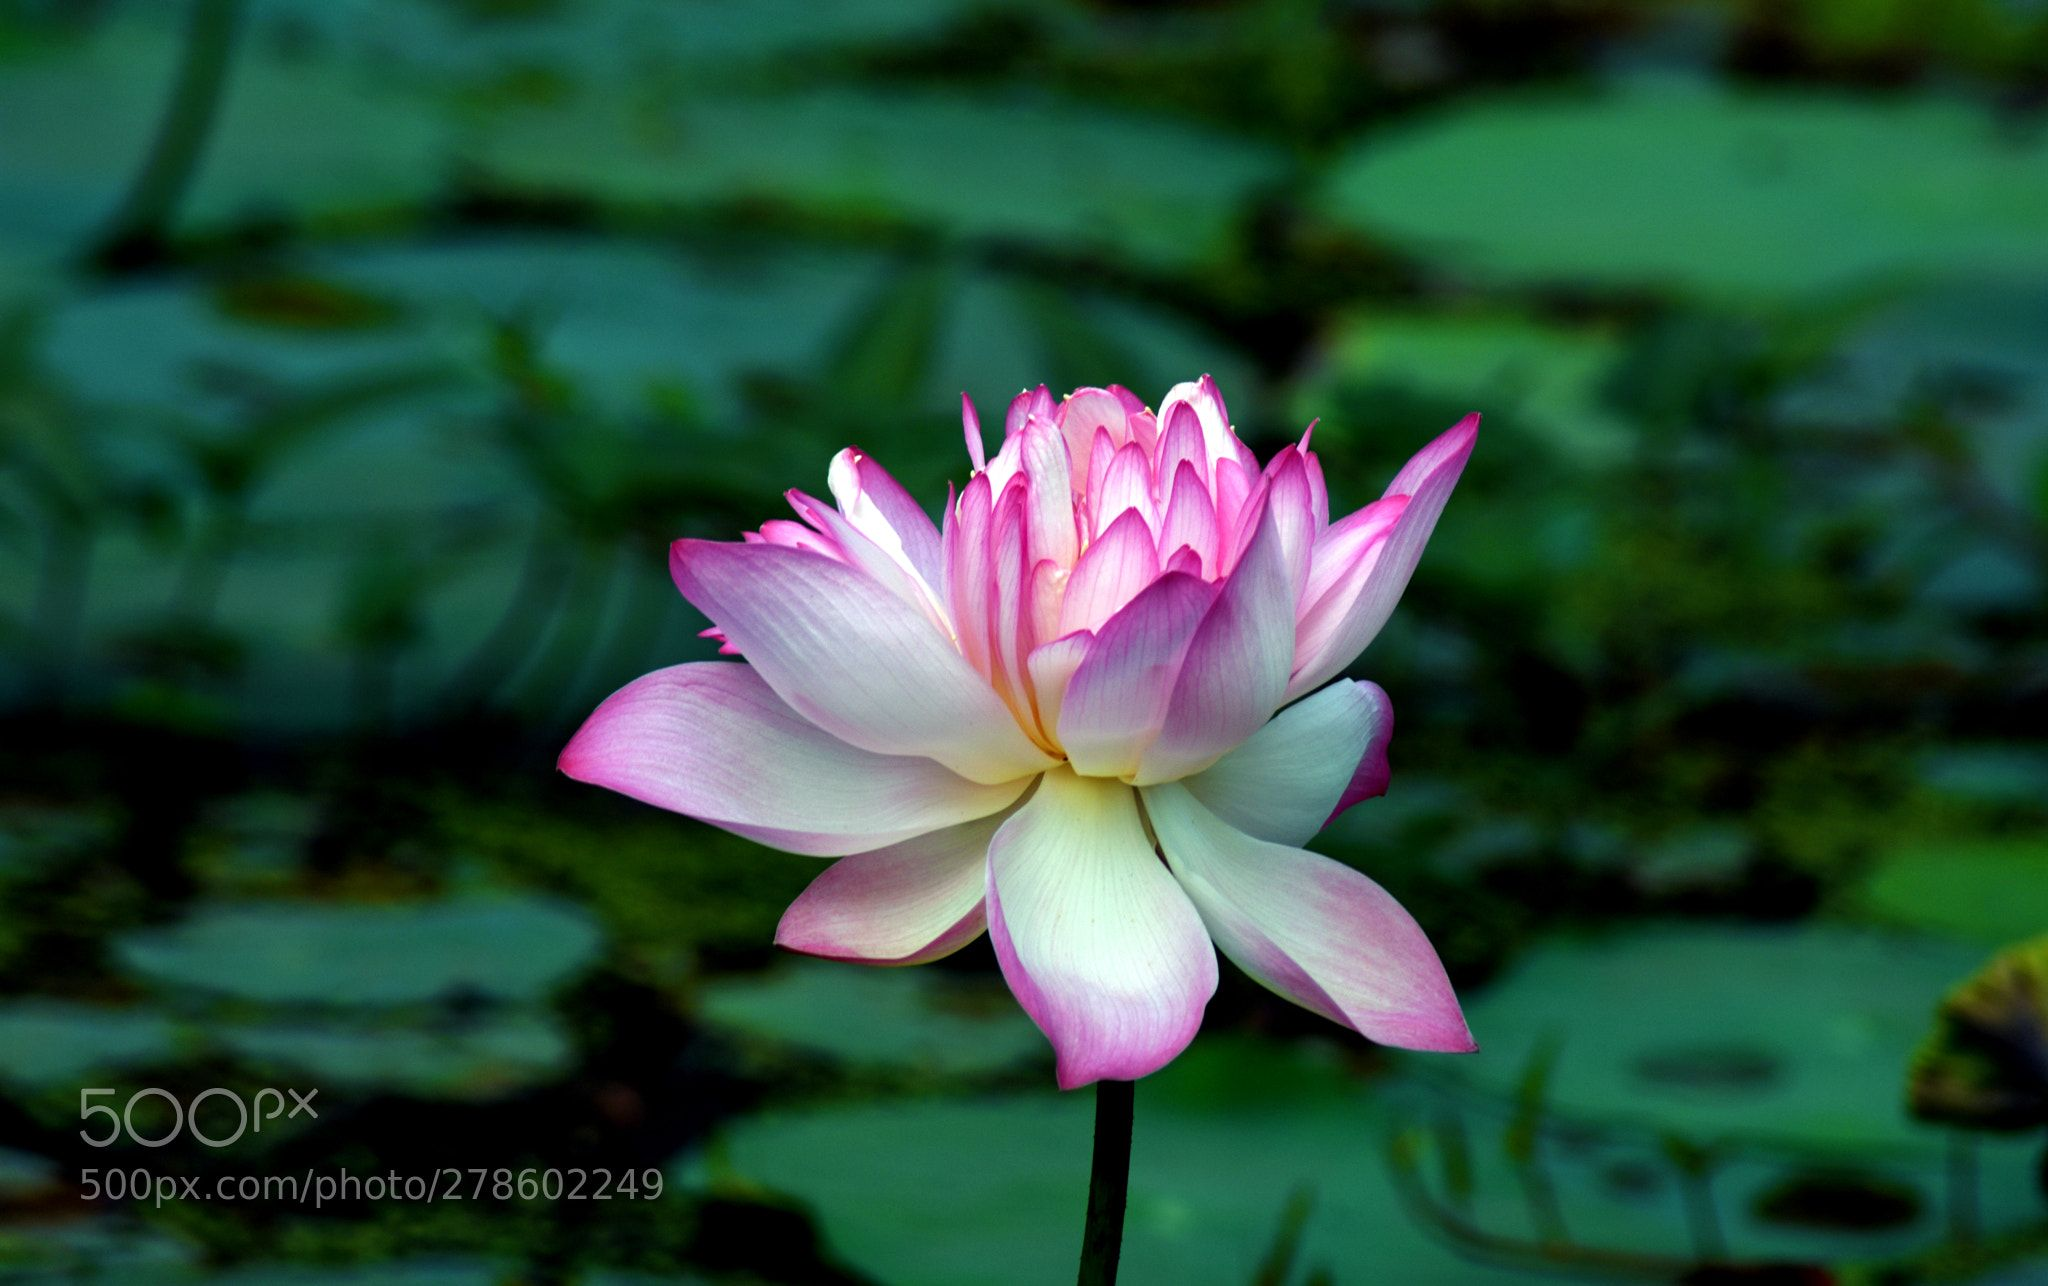 Indian Lotus Nelumbo nucifera is species of aquatic plant